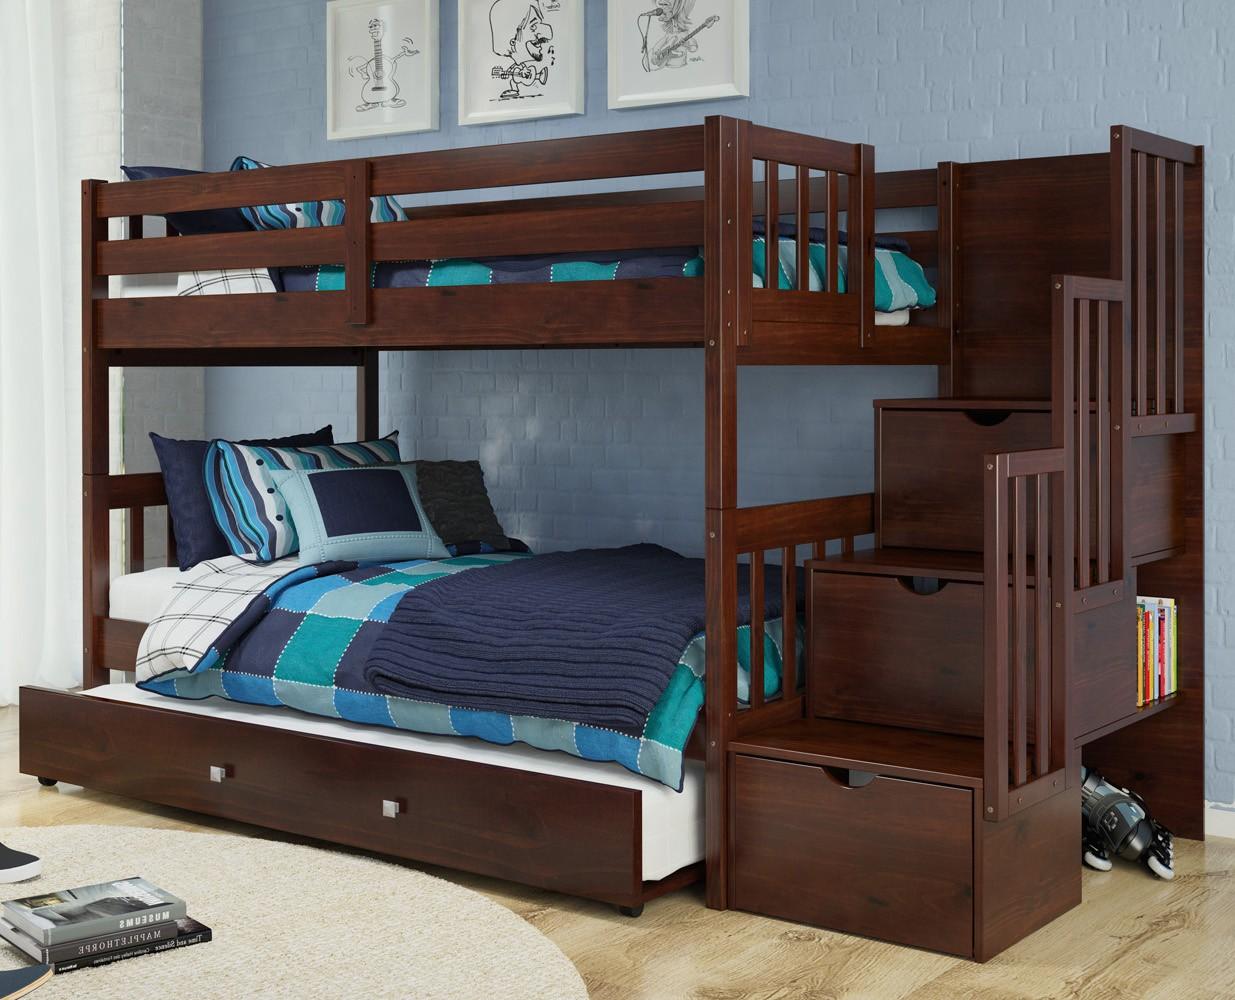 1019-TTCP Stairway Bunk Bed